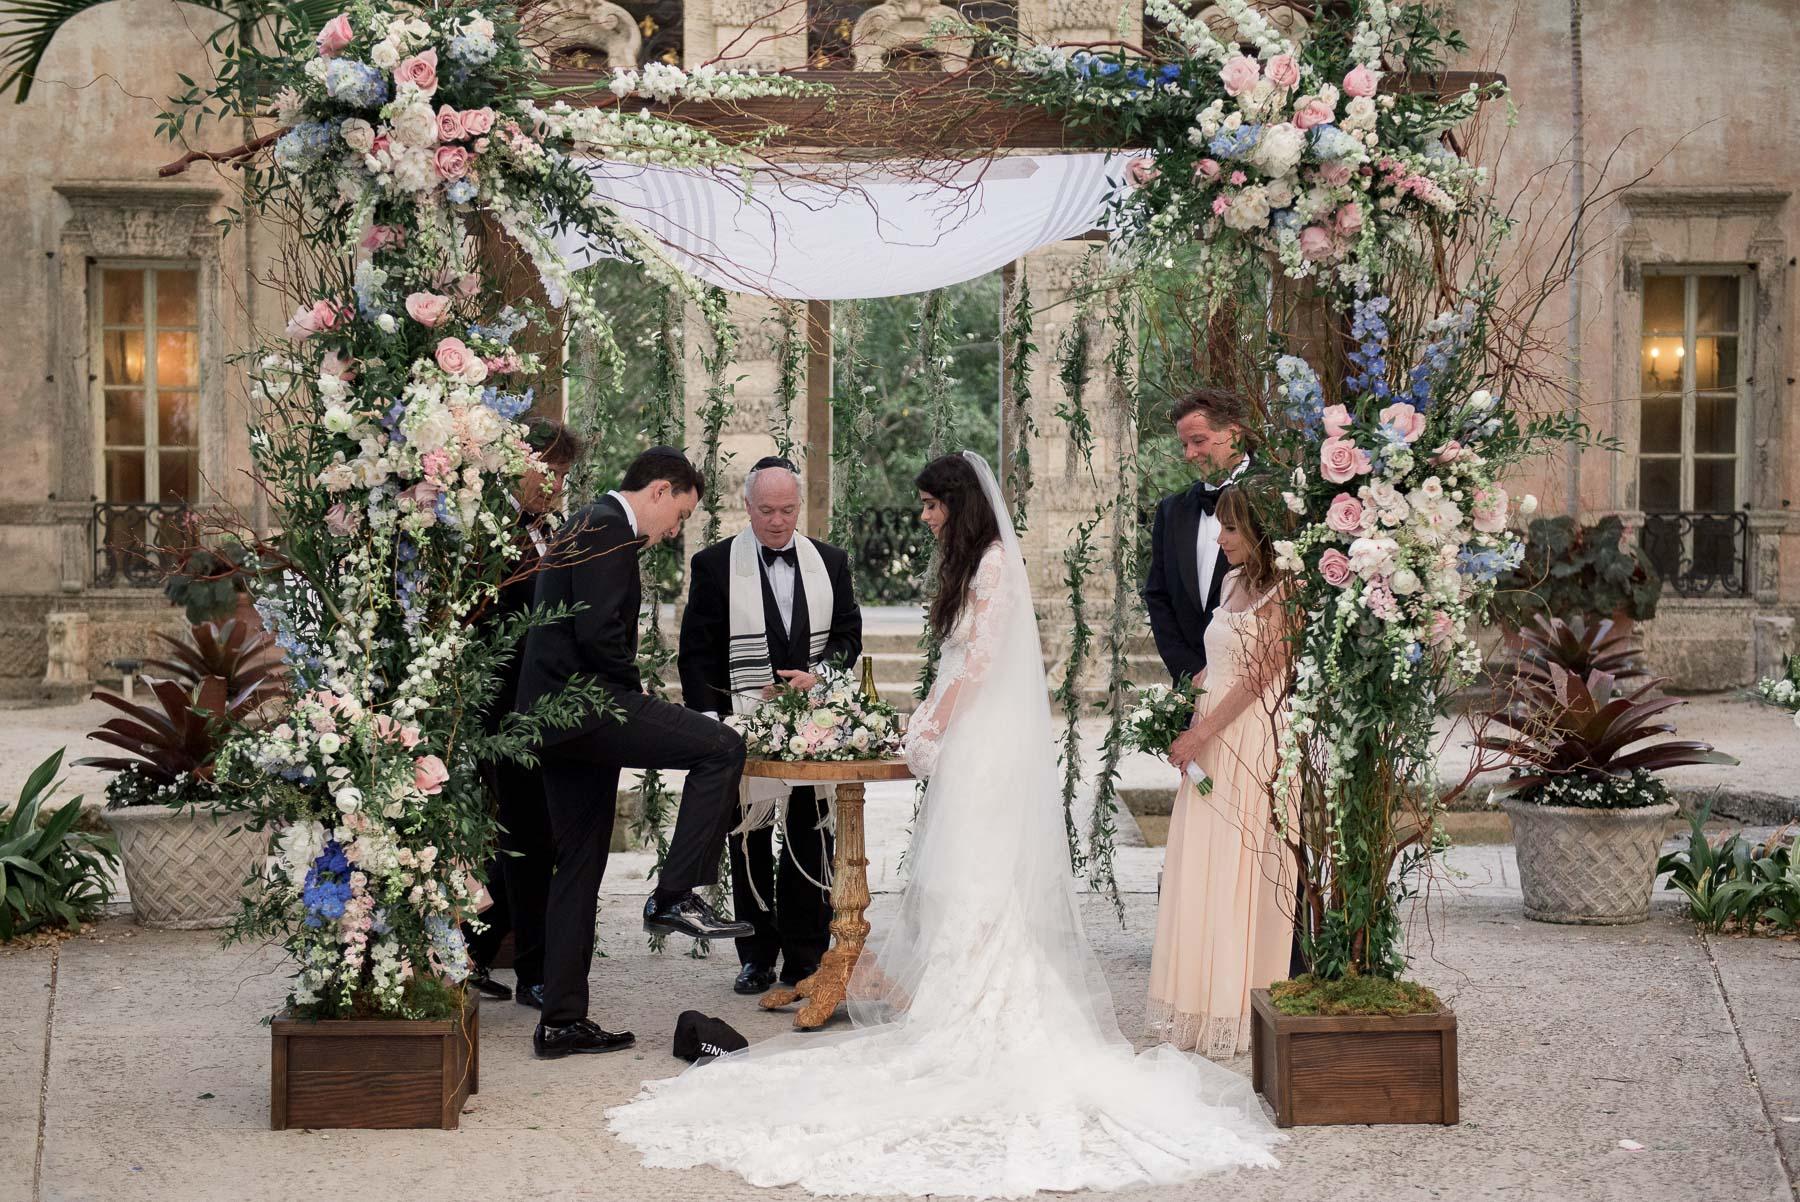 52-vizcaya-museum-wedding-photography.jpg